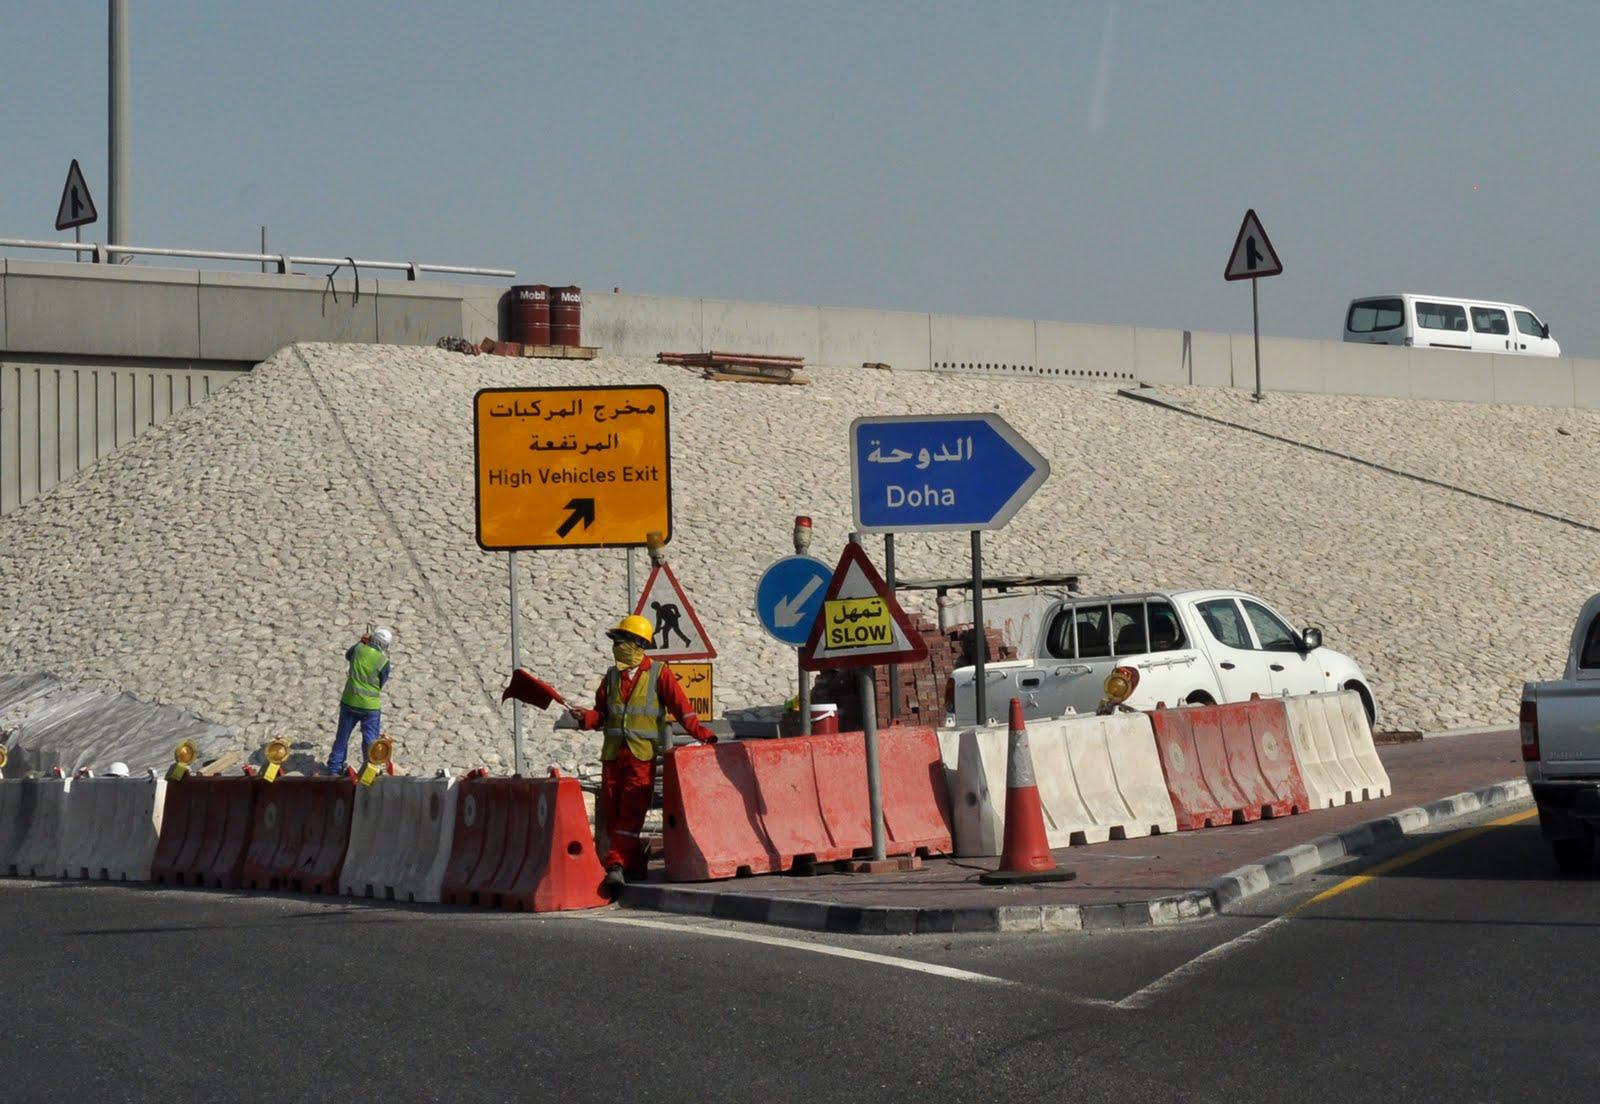 http://4.bp.blogspot.com/_0-CKSylQDrE/TL2JVaS_XwI/AAAAAAAAH0M/Ur9ZSoq-8Vc/s1600/construction+doha.jpg